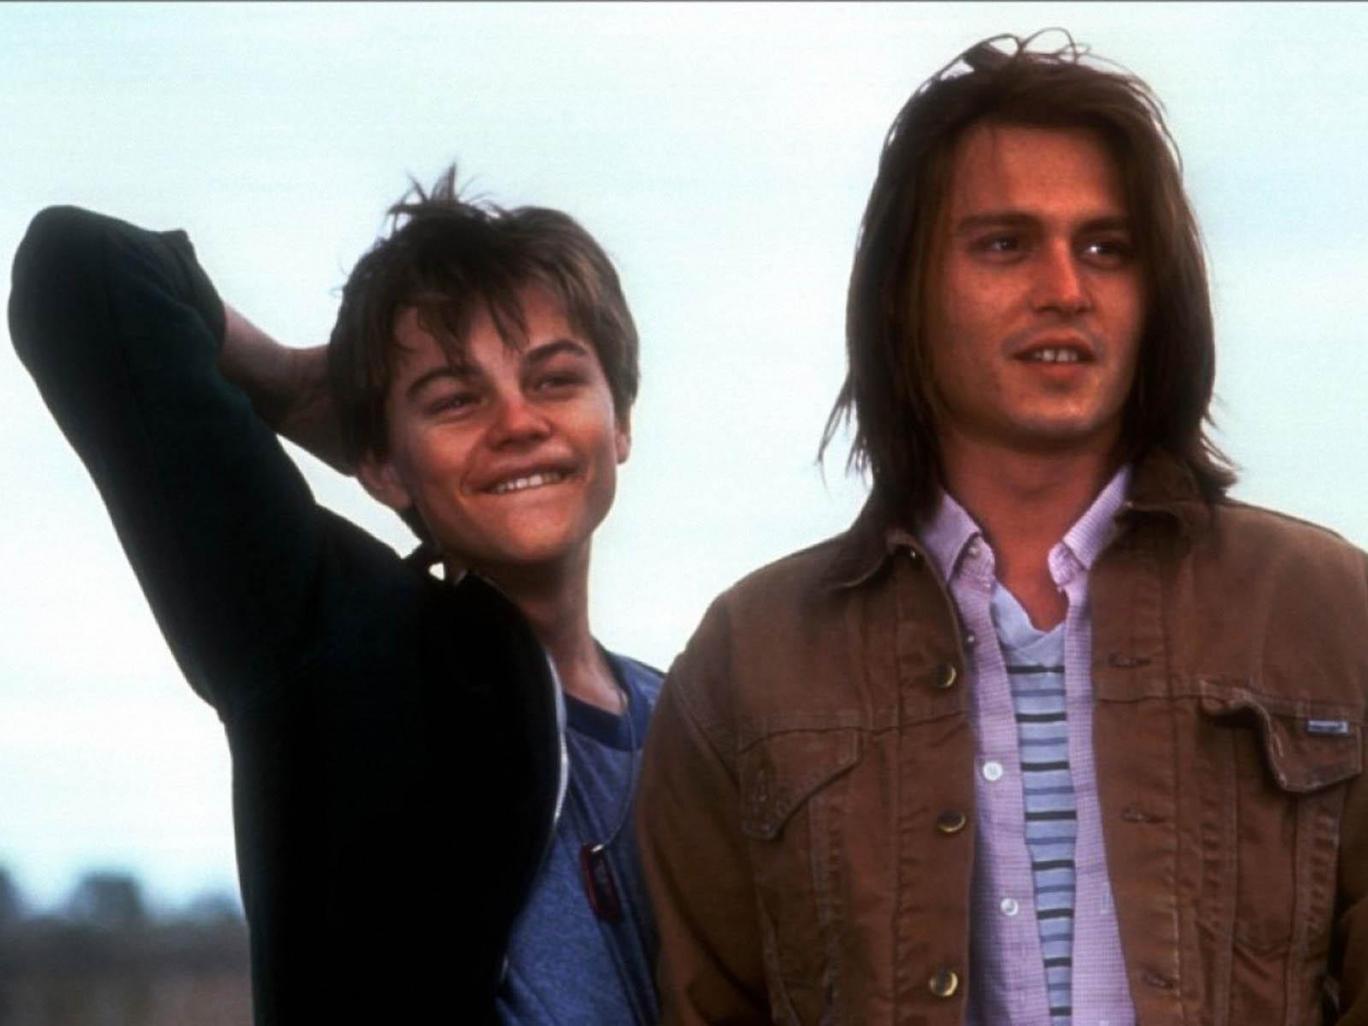 Johnny Depp on working with Leonardo DiCaprio: 'I tortured him'